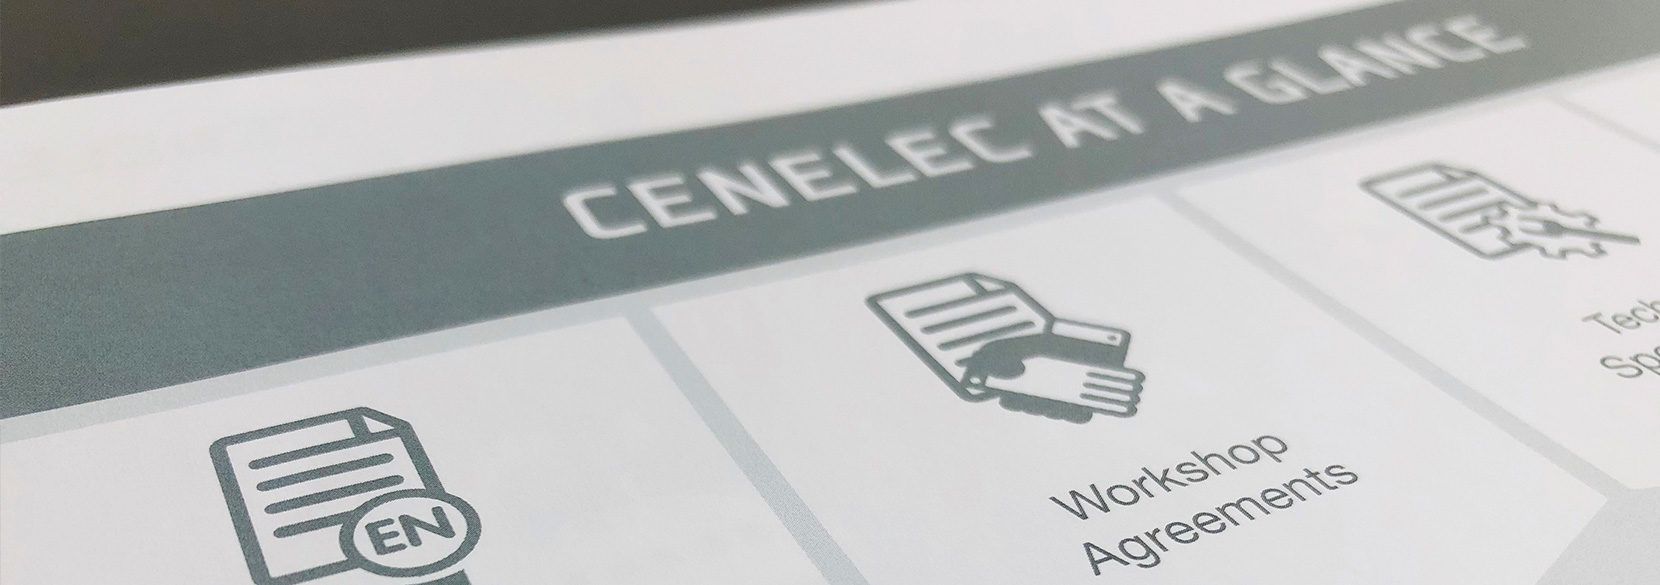 CENELEC – Electrosuisse